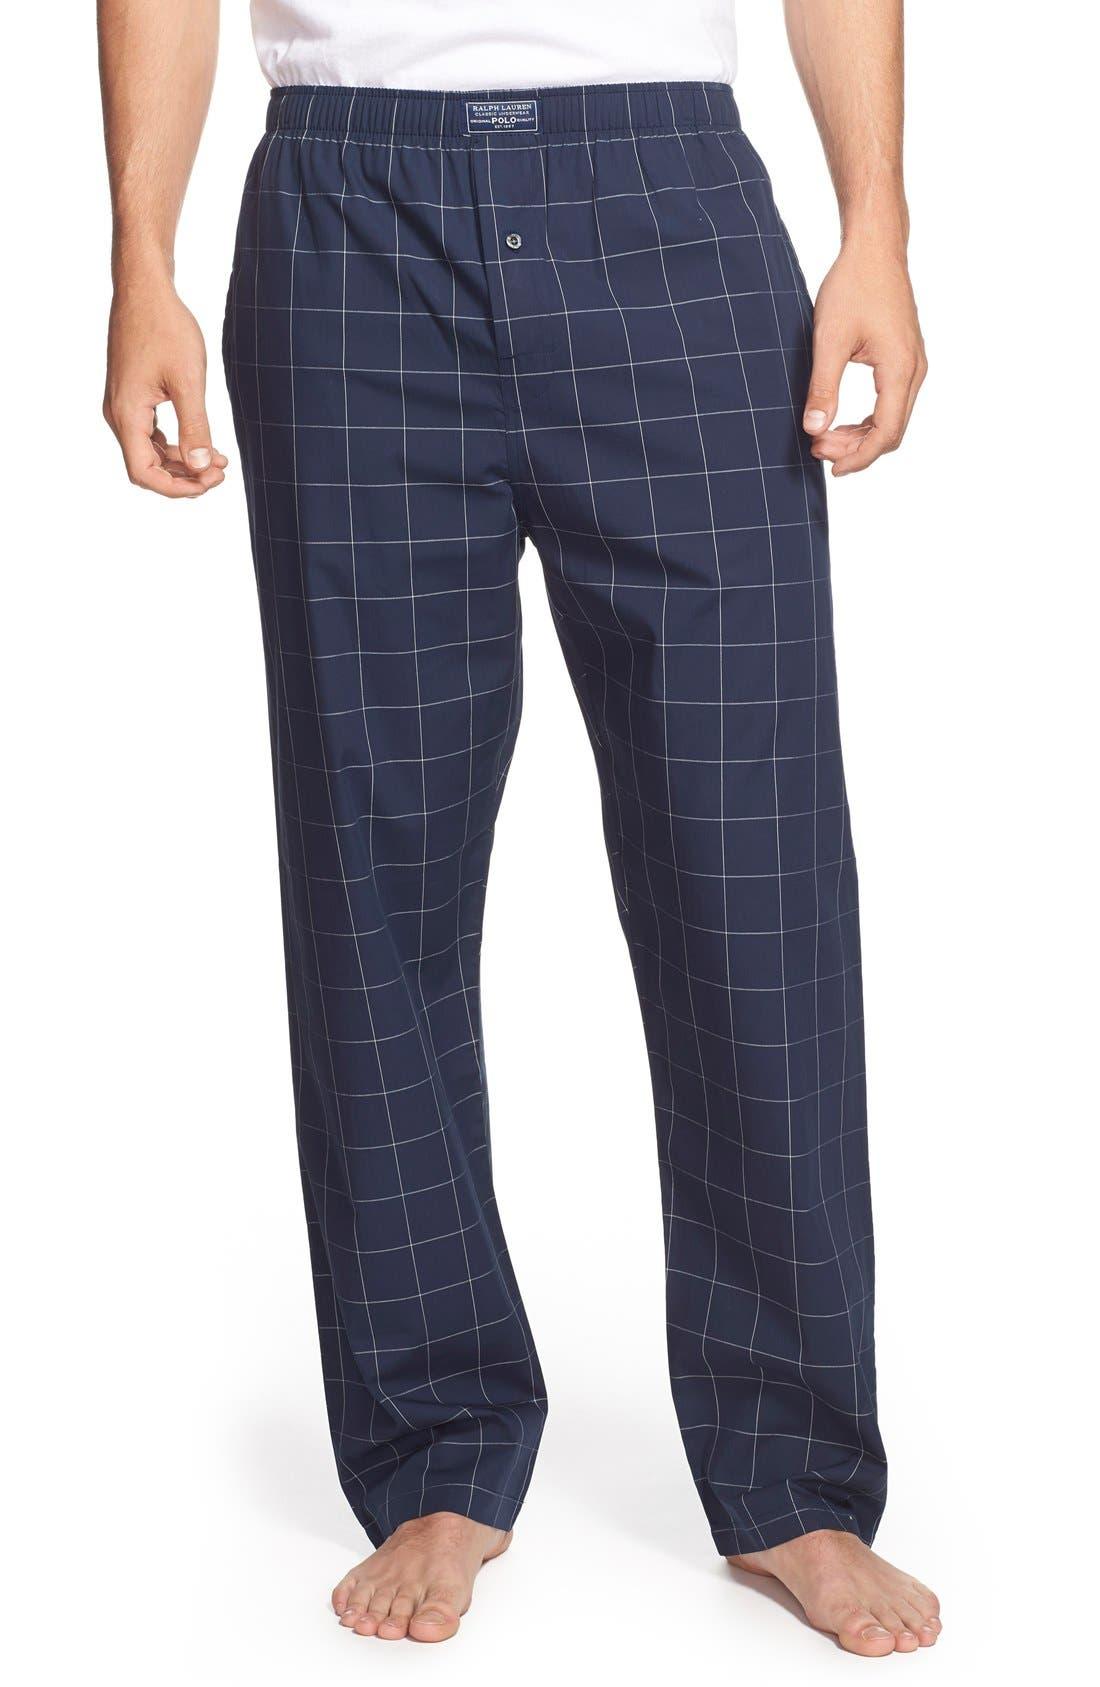 Free shipping on Polo Ralph Lauren men's pajamas at coolvloadx4.ga Shop pajama sets, lounge pants, robes & more. Totally free shipping & returns.